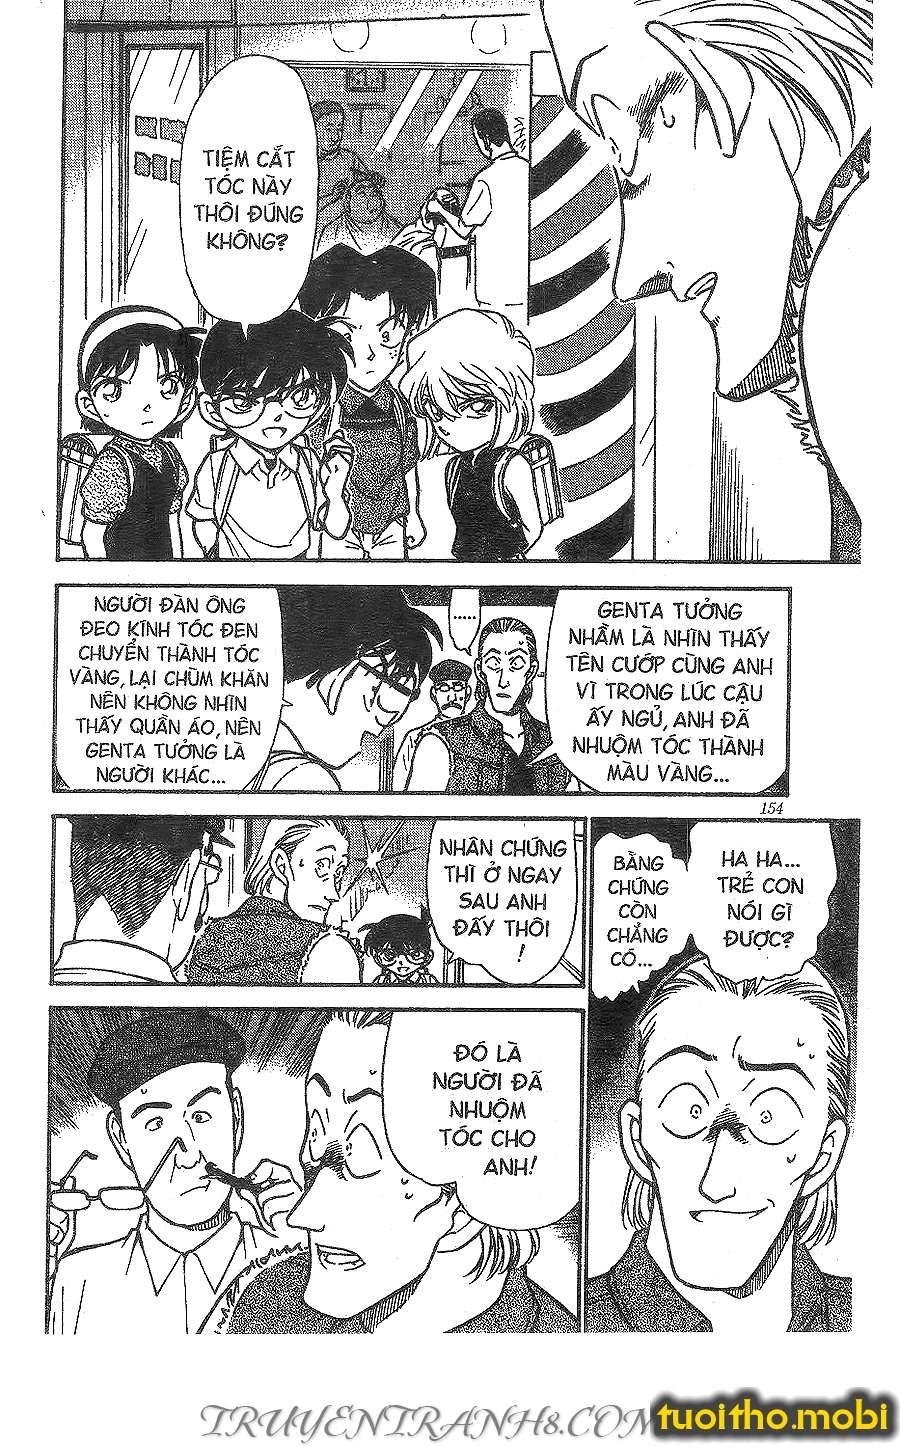 conan chương 304 trang 11